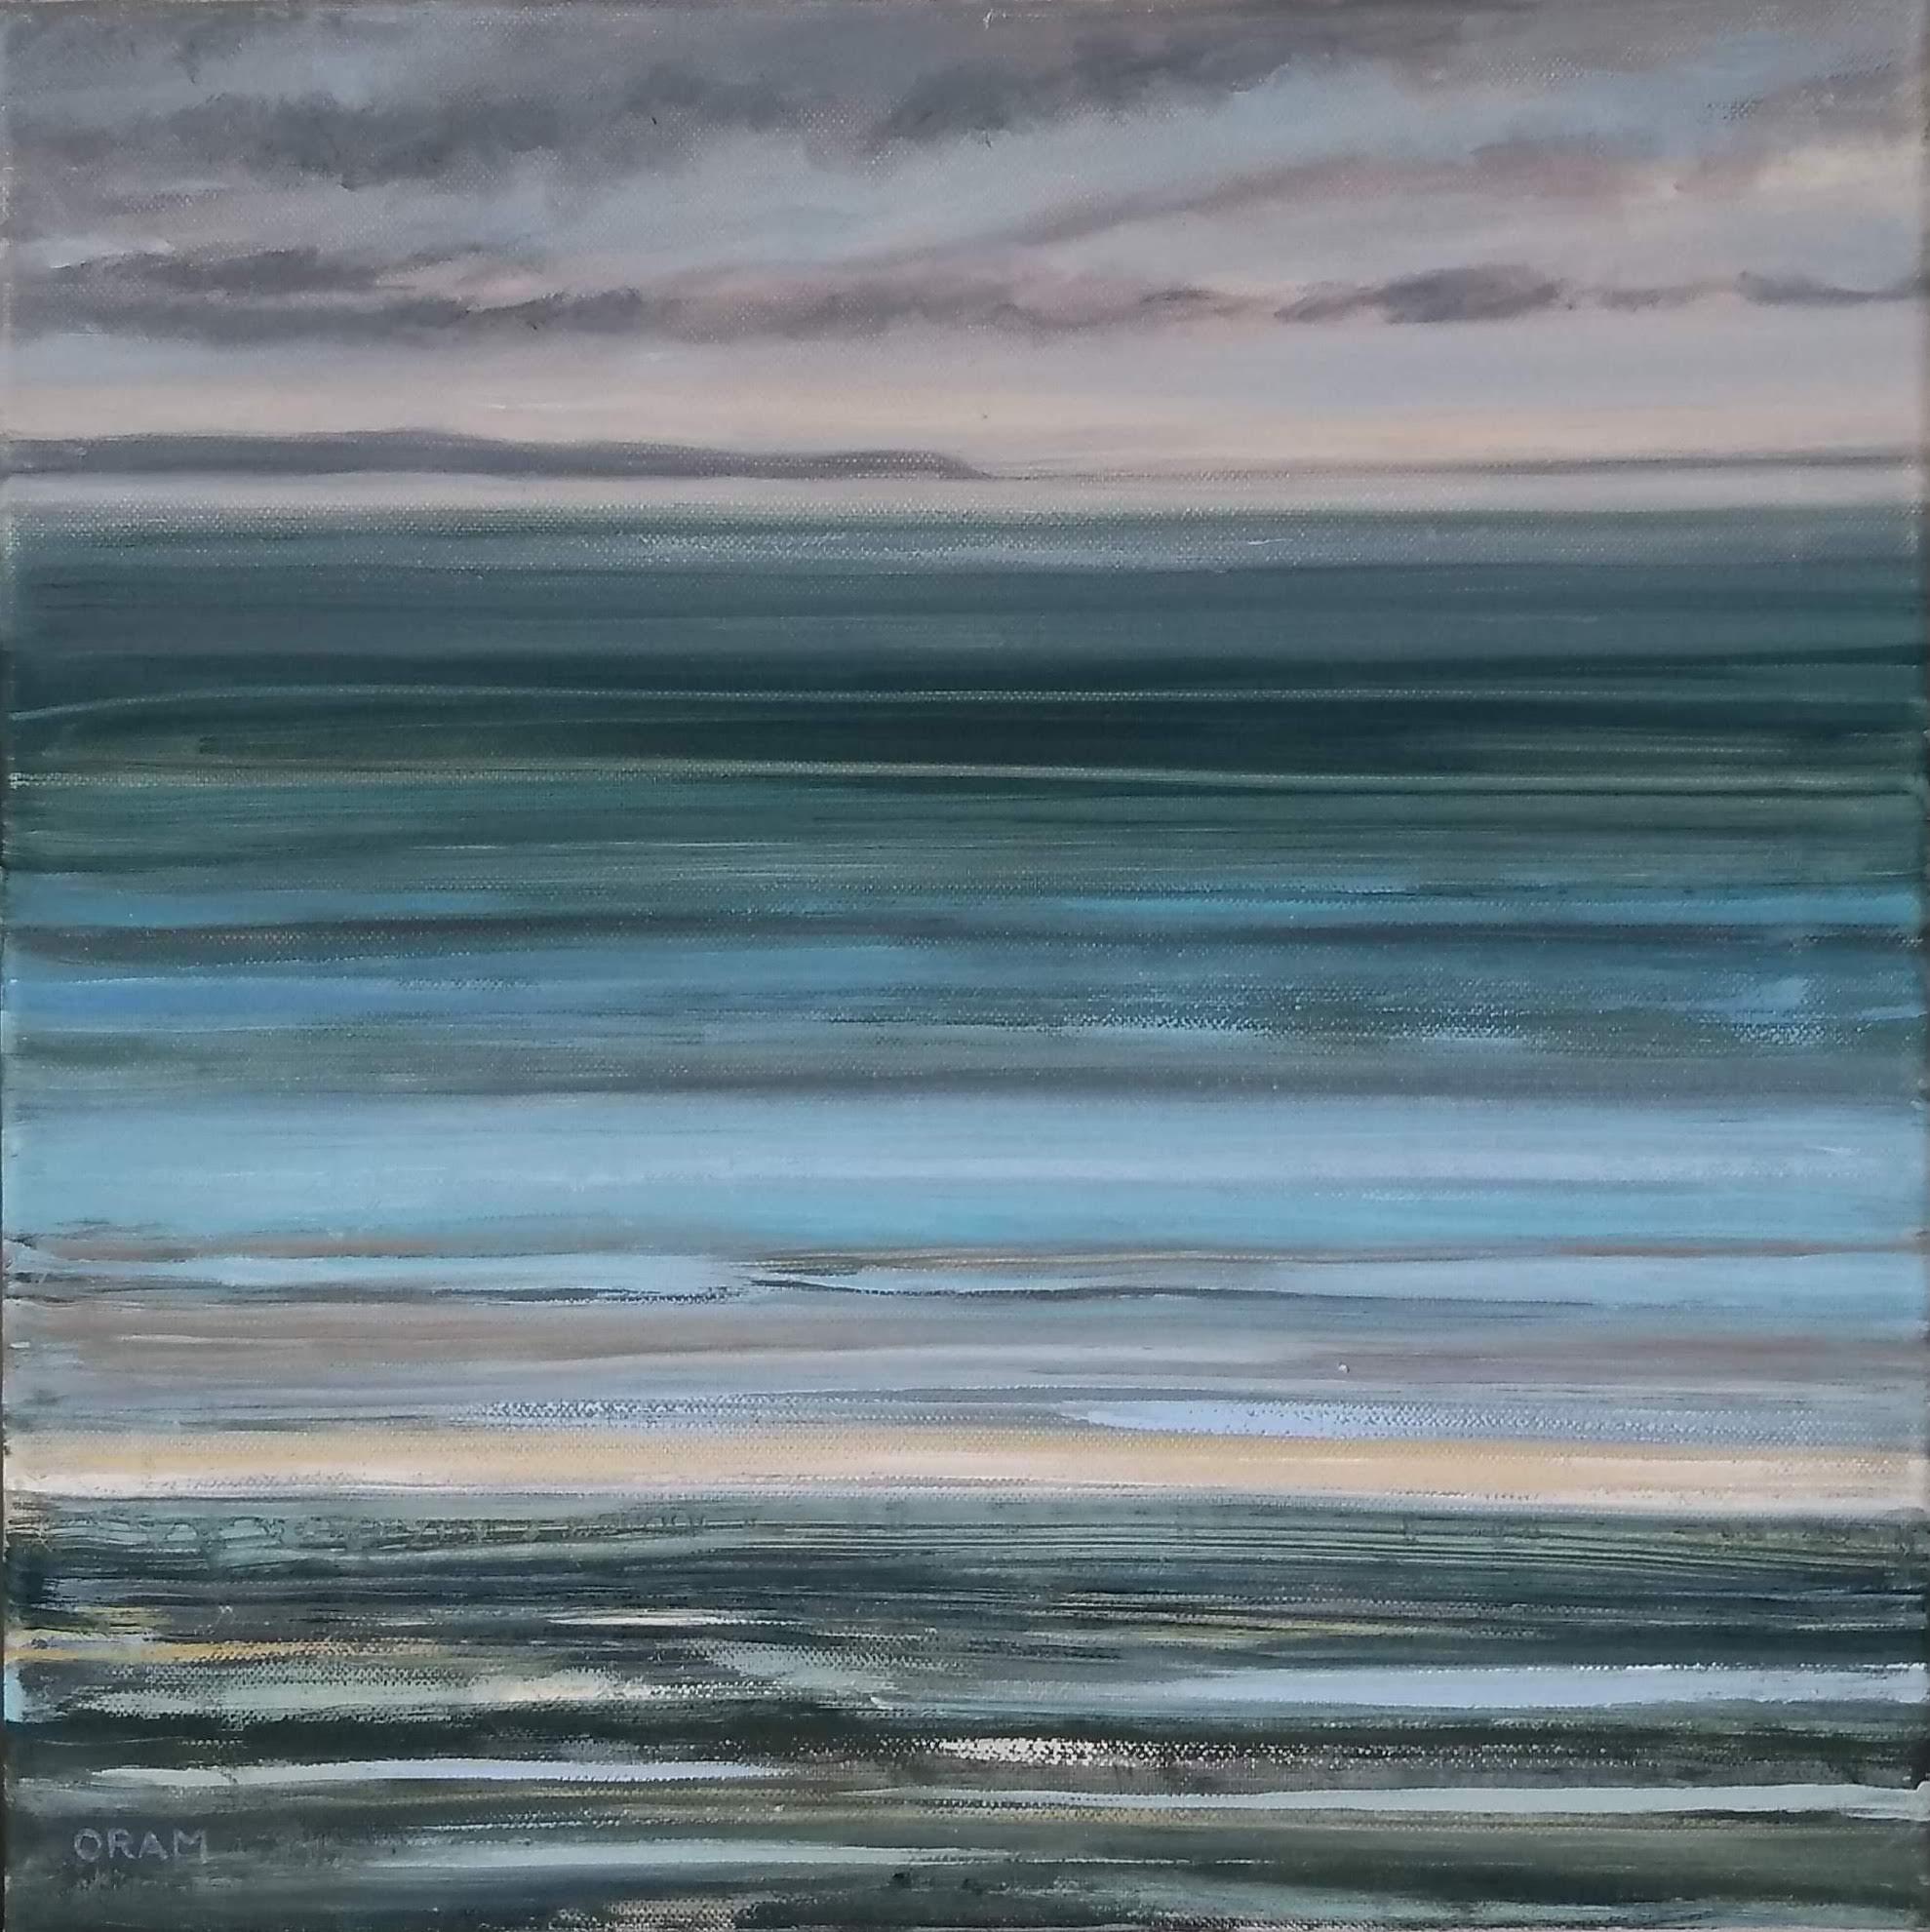 Warm Layered Sea